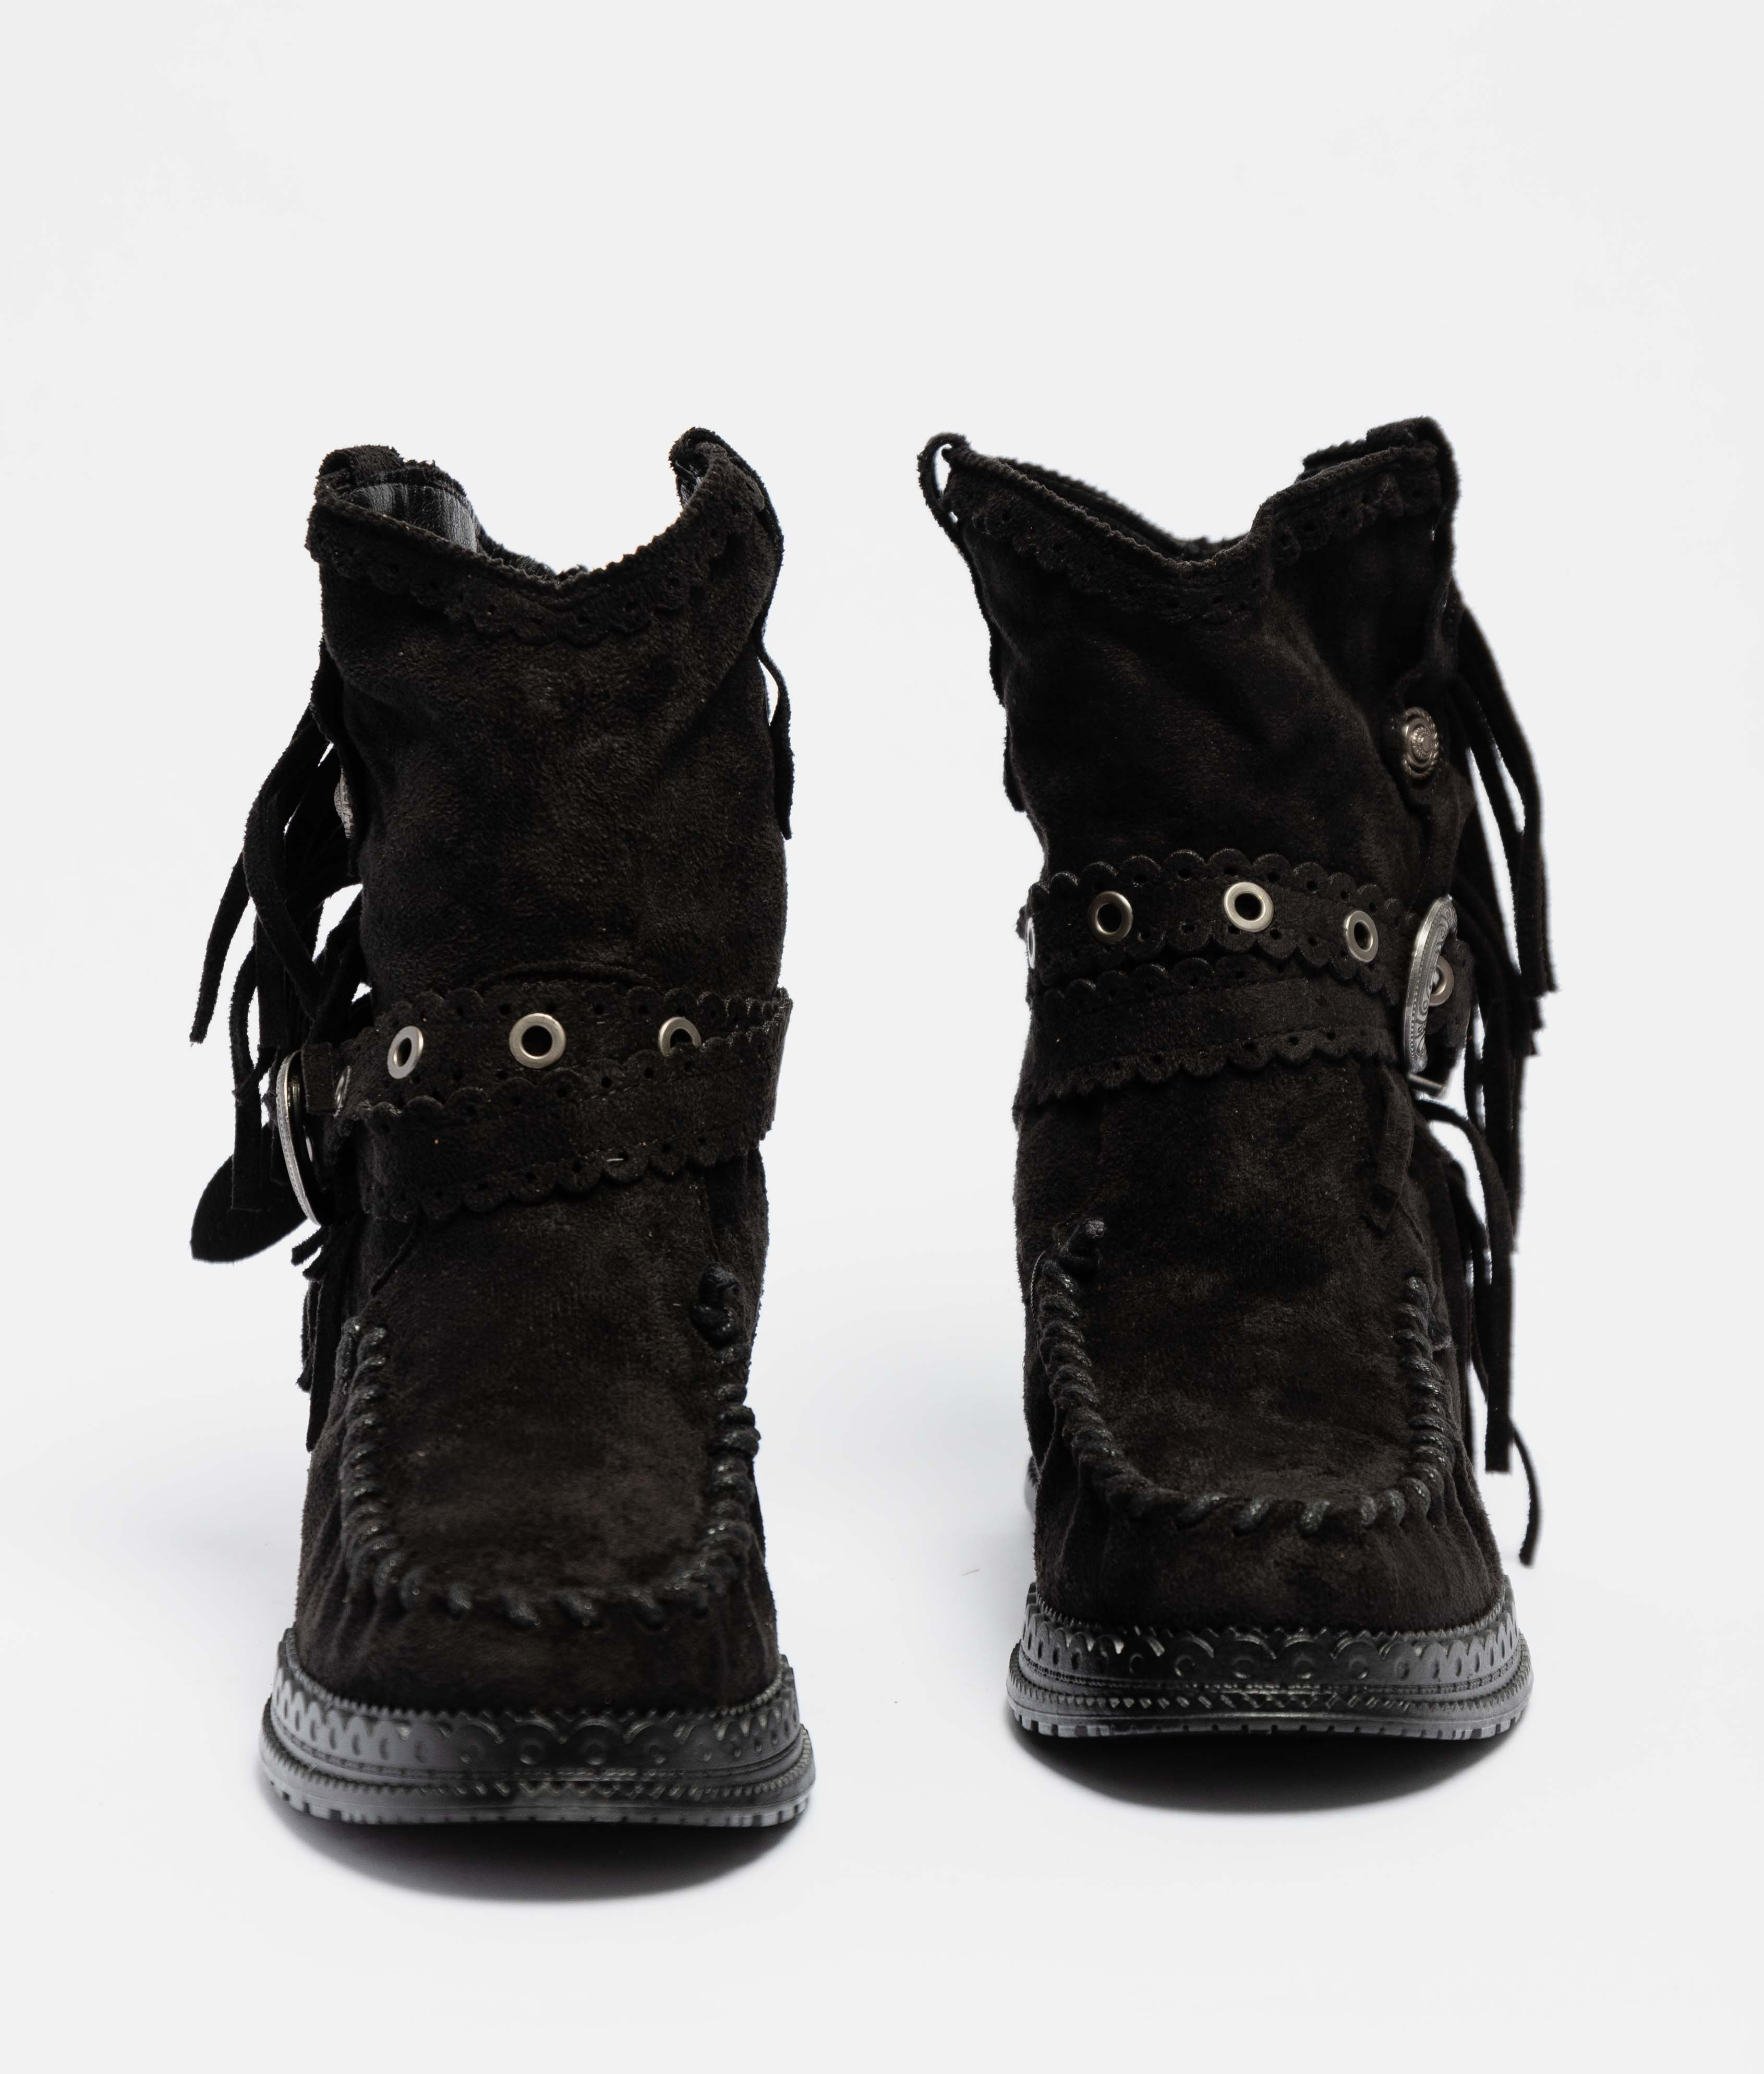 Elma Low Boot - Black